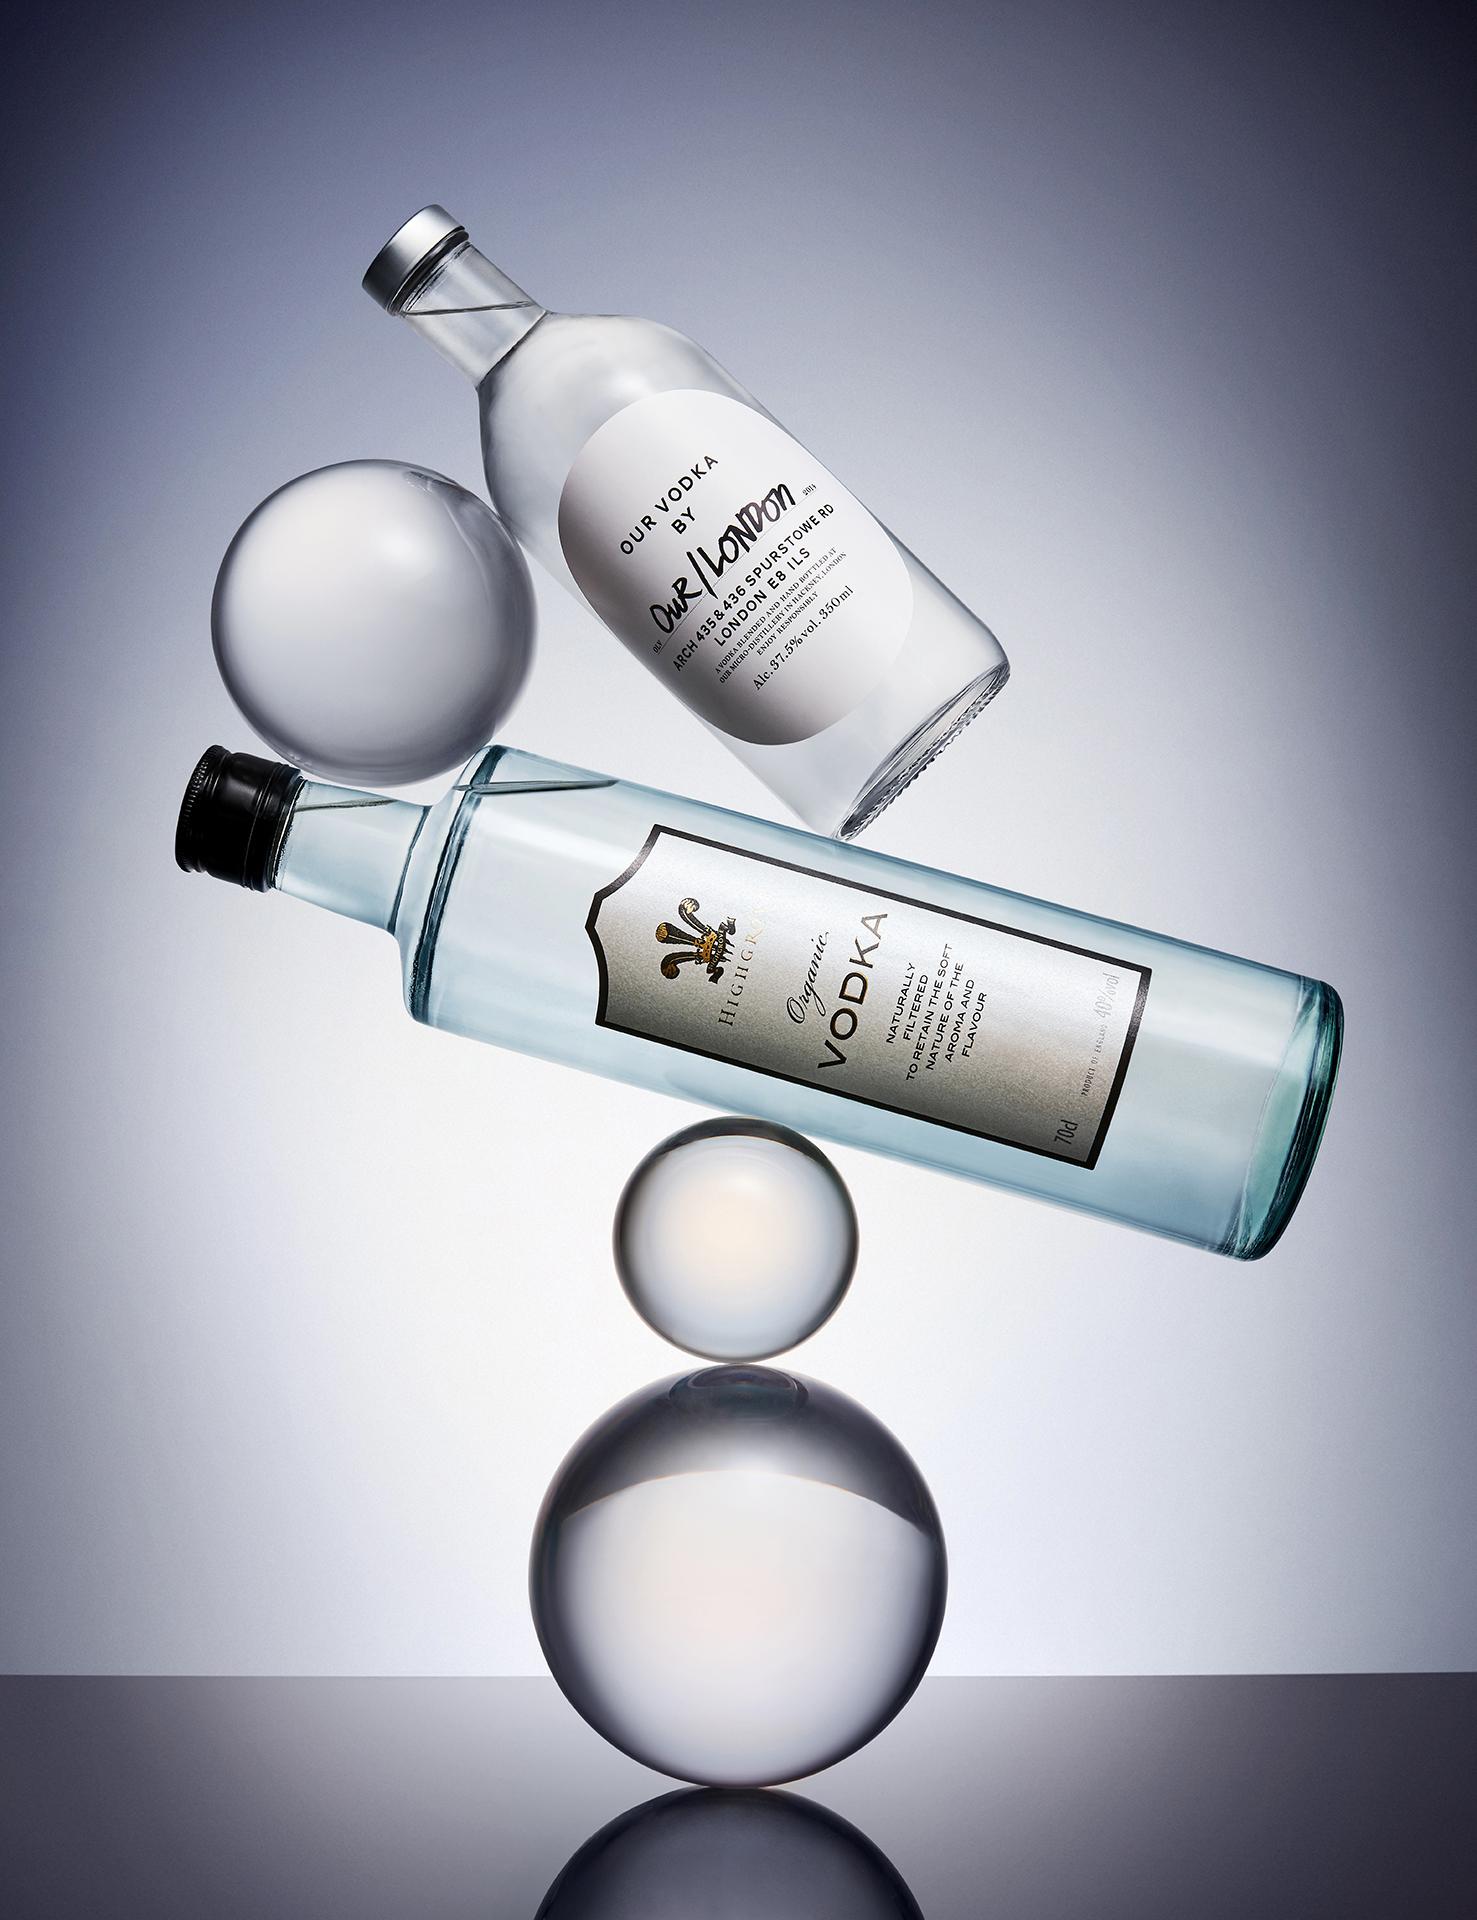 alcohol-photography-still-life-glass-crystal-ball-balace-impossible-josh-caudwell-4.jpg